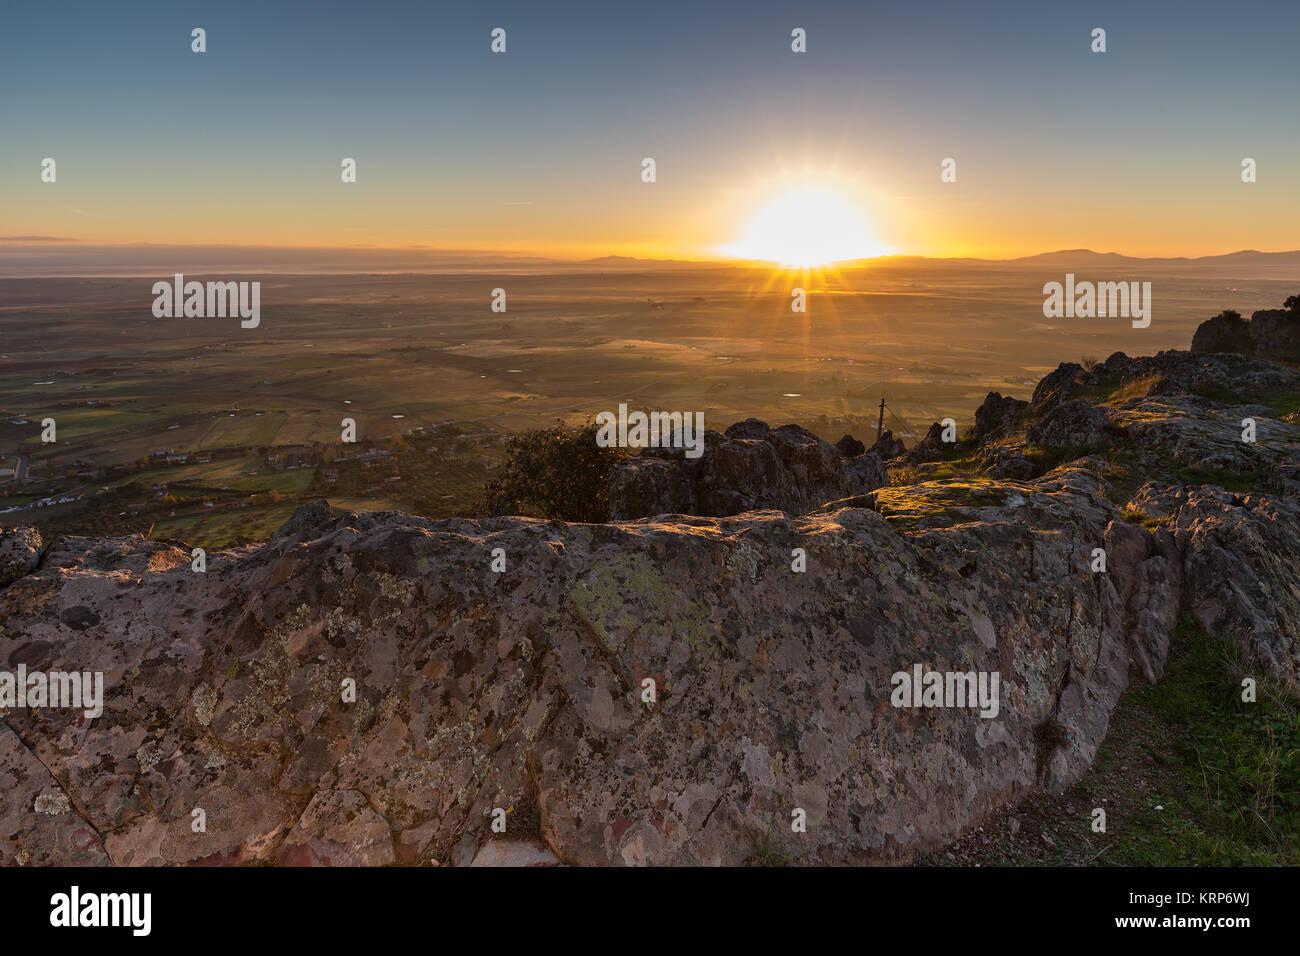 Alba da una montagna vicino alla Sierra de Fuentes. Spagna. Foto Stock